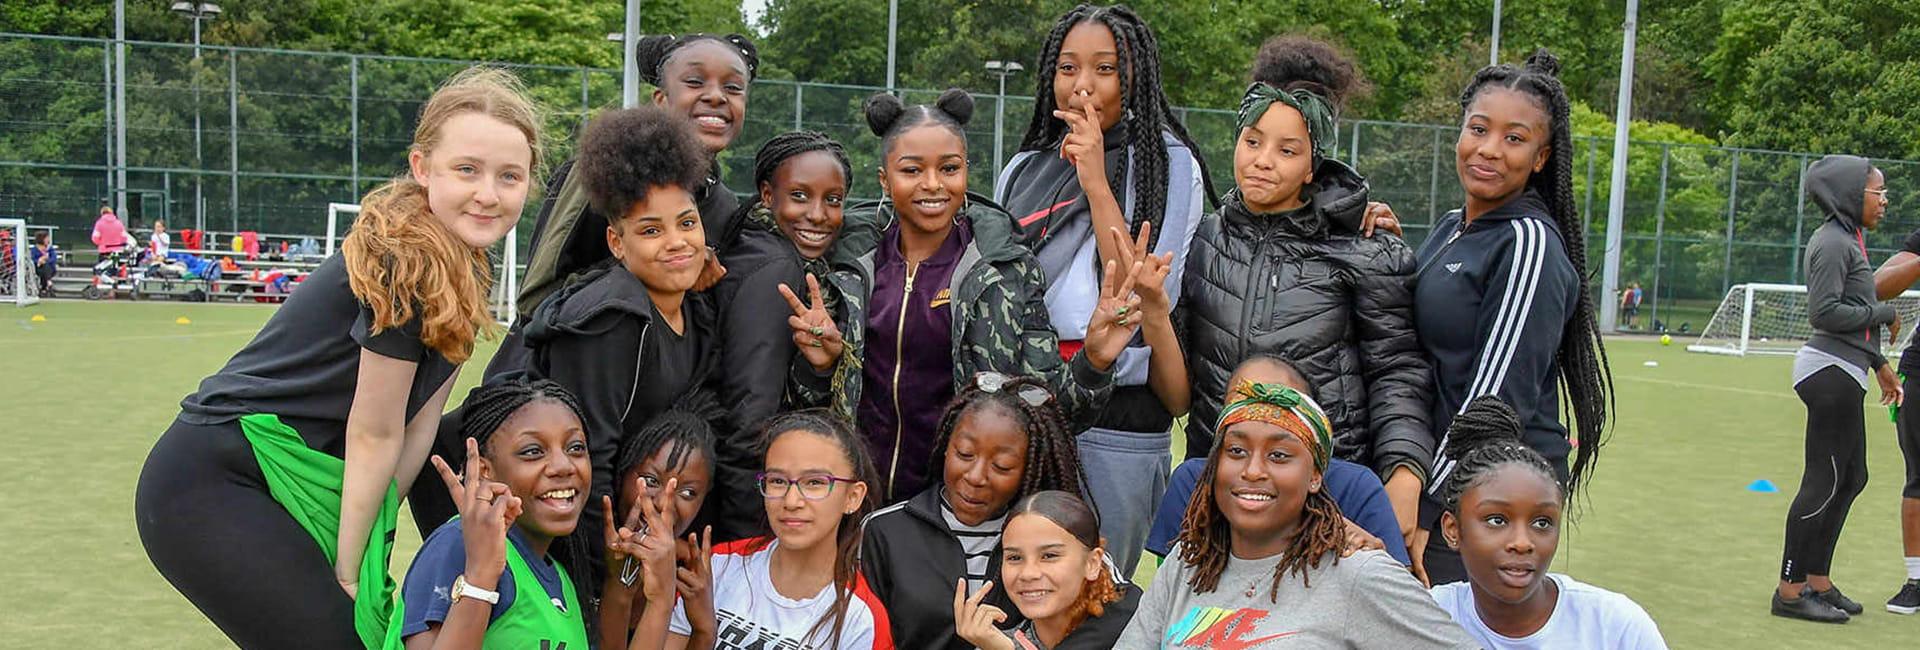 London Rapper hails Changing programme